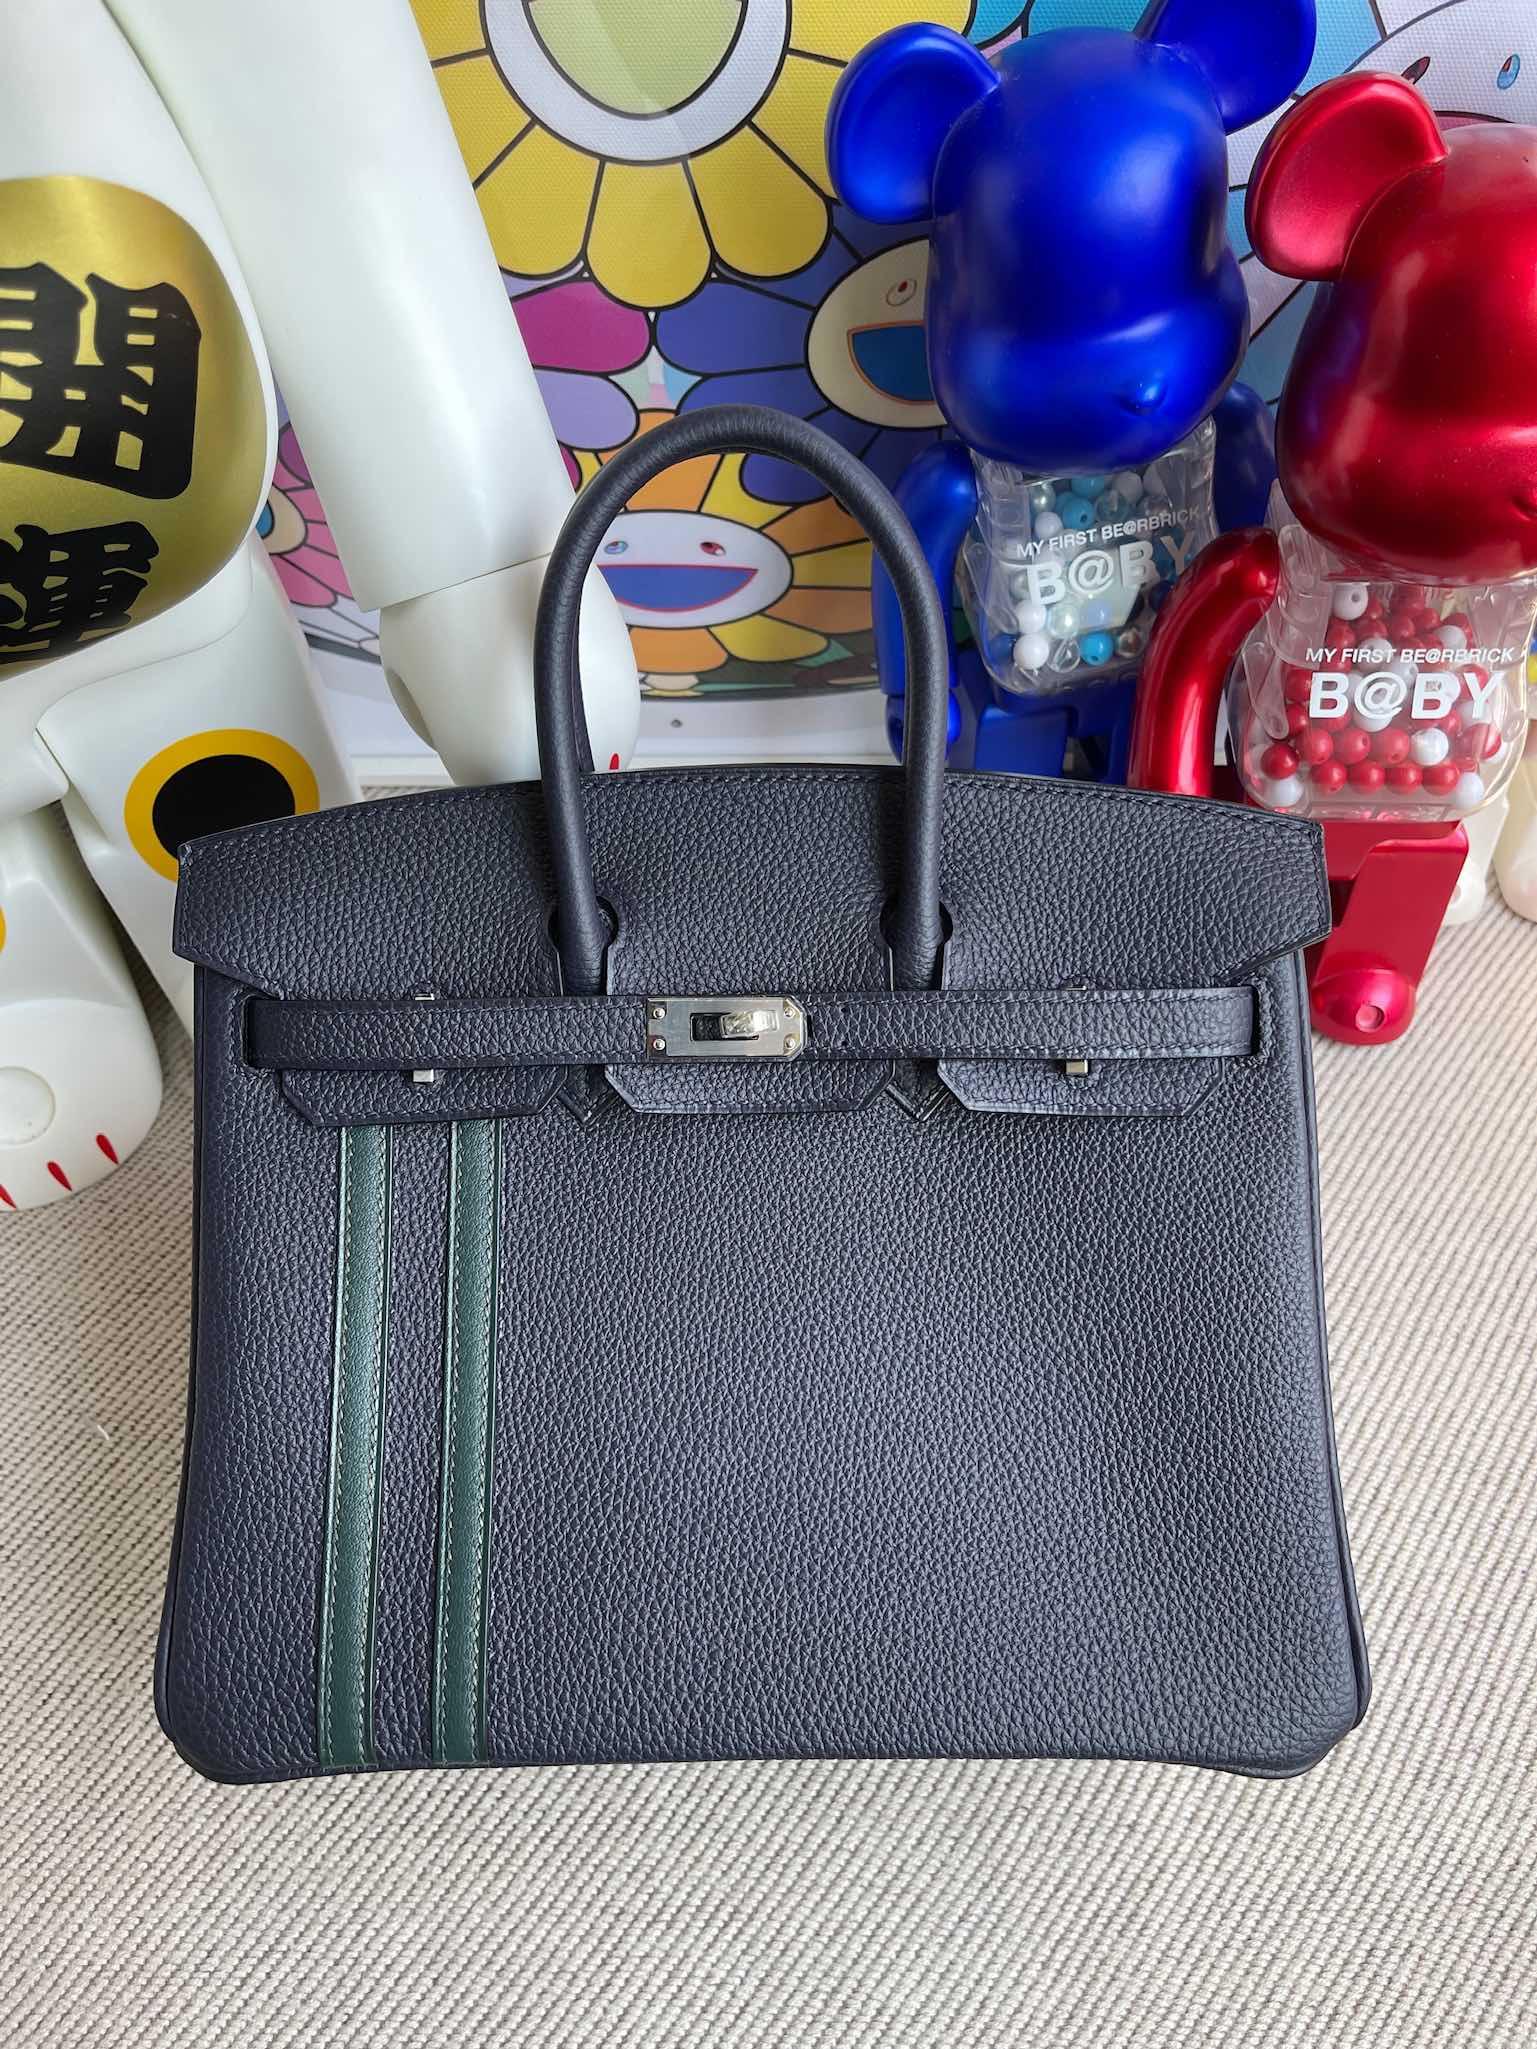 Hermès(爱马仕)Birkin 铂金包 原厂小牛皮 togo 午夜蓝拼双杠柏树绿 银扣 25cm 顶级手缝